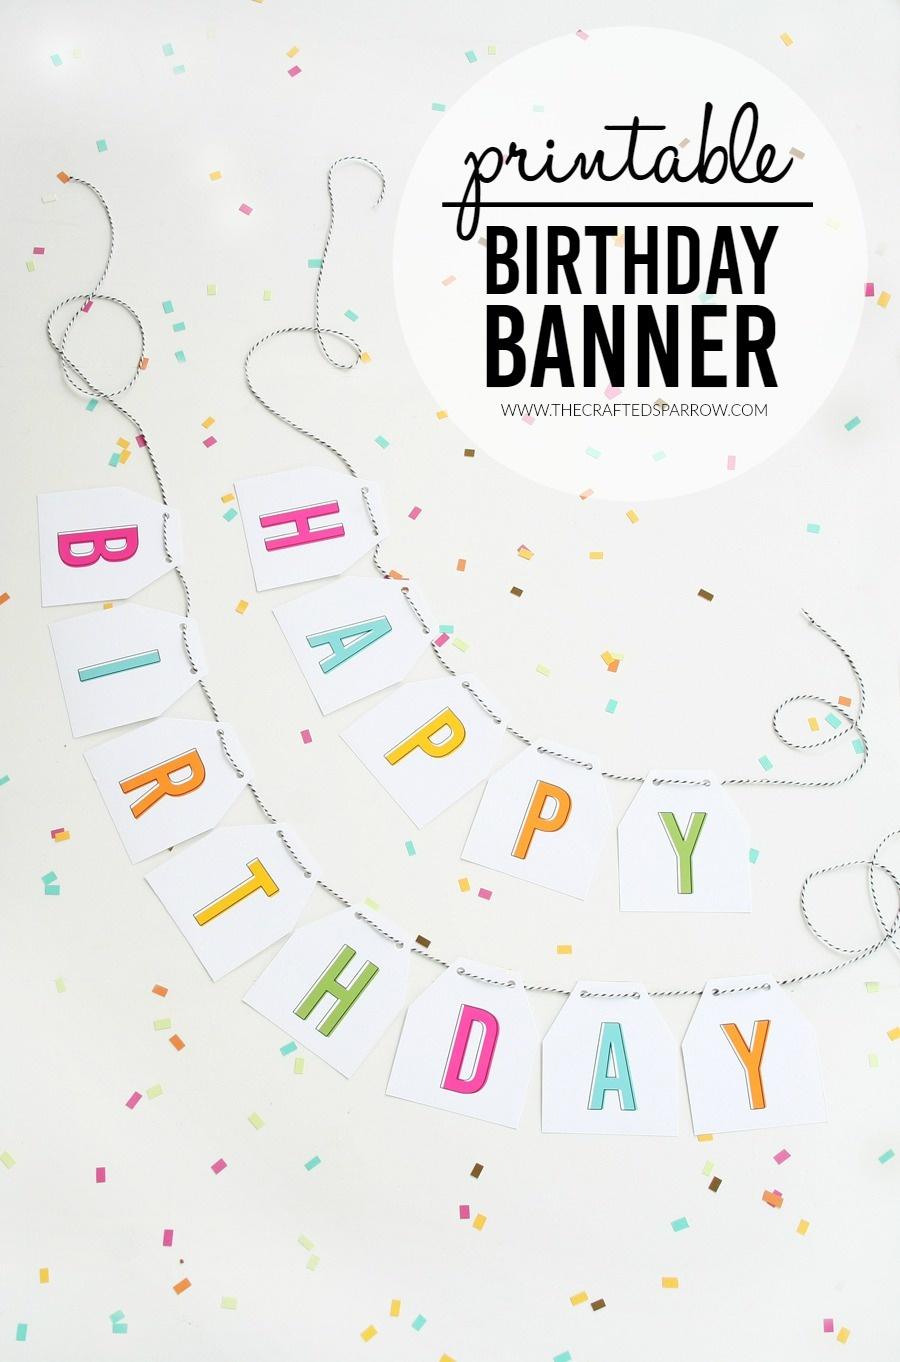 Free Printable Birthday Banners - The Girl Creative - Free Printable Happy Birthday Signs